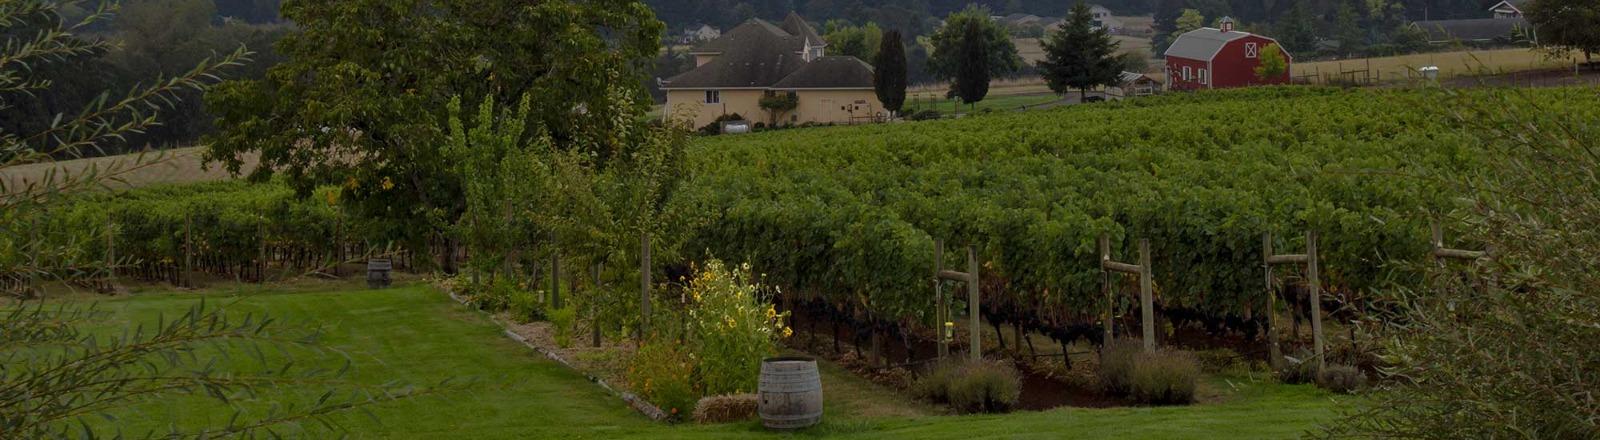 Rain from clouds over Wilsonville's Terra Vina Wines vineyard provide nourishment to the grape vines during grape growing season in oregon's mt hood territory